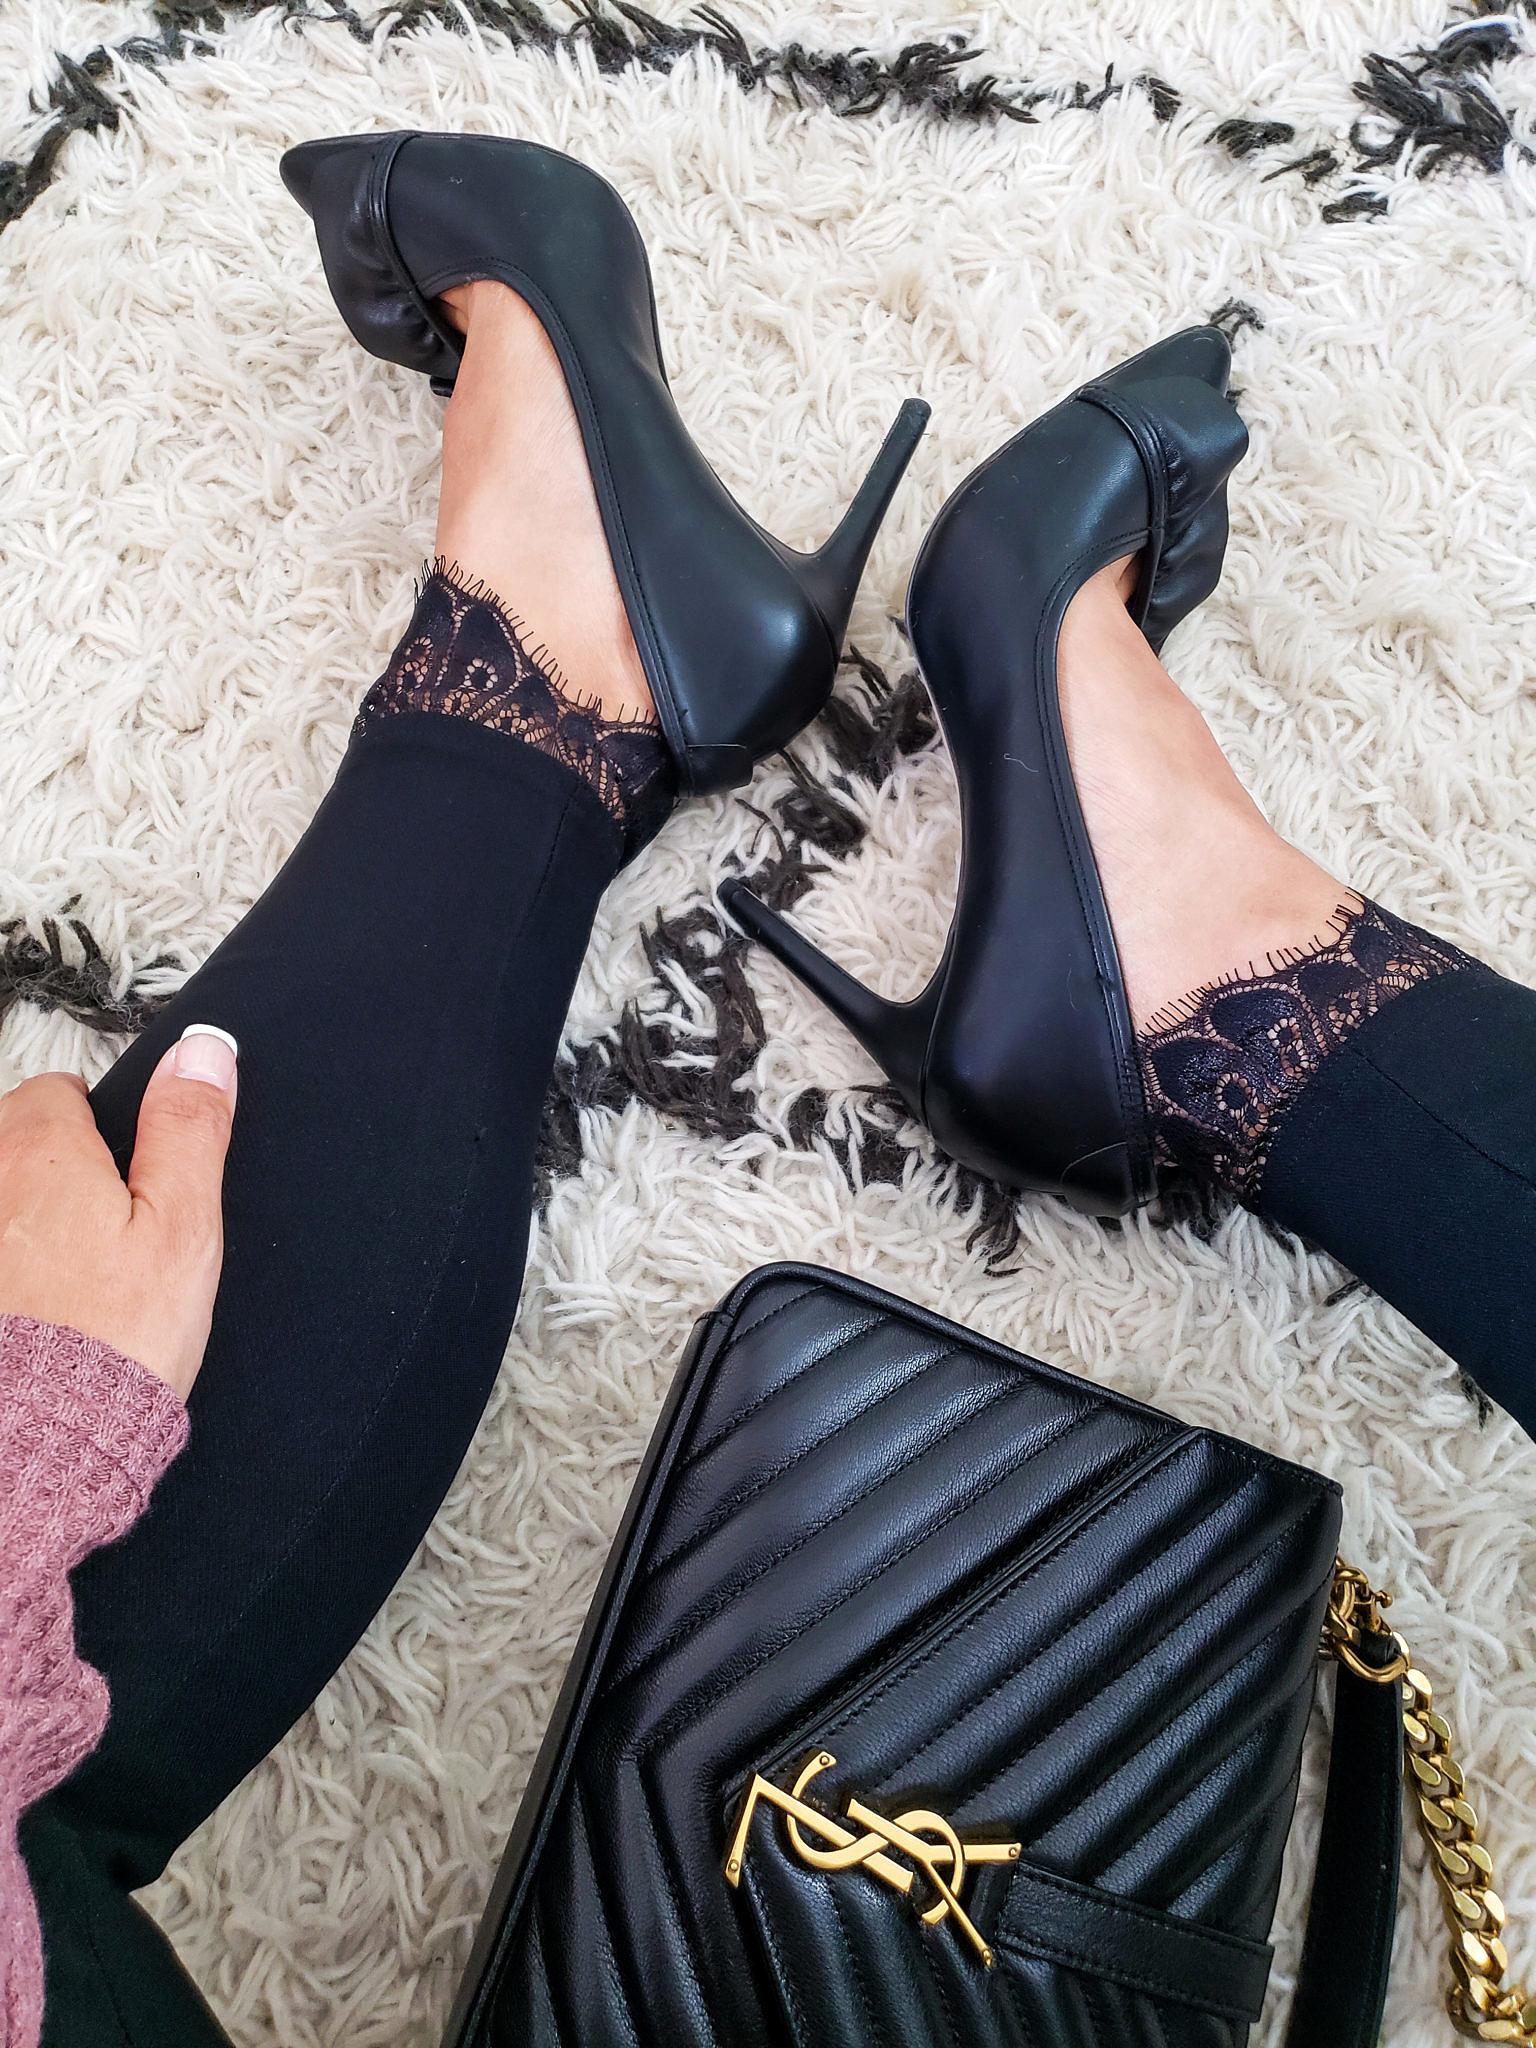 Amaryllis Apparel Try-On Clothing Haul